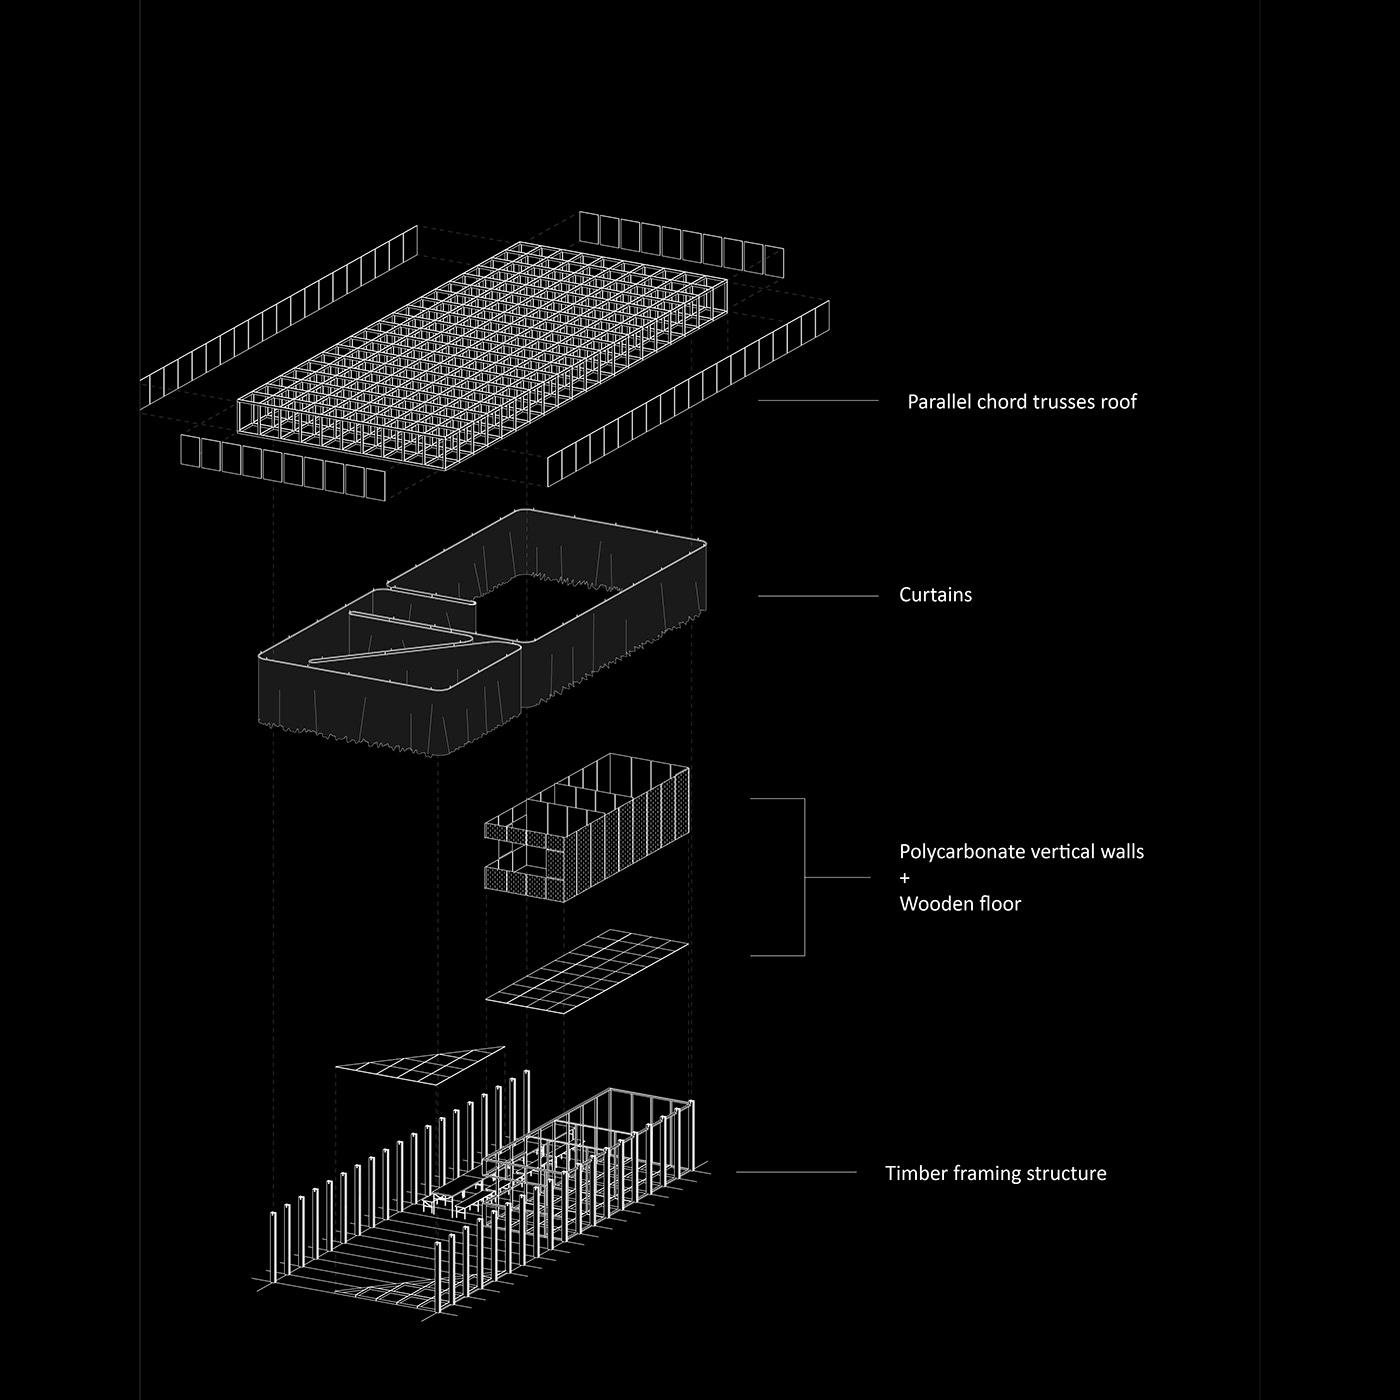 SCORE Architecture工作室设计图